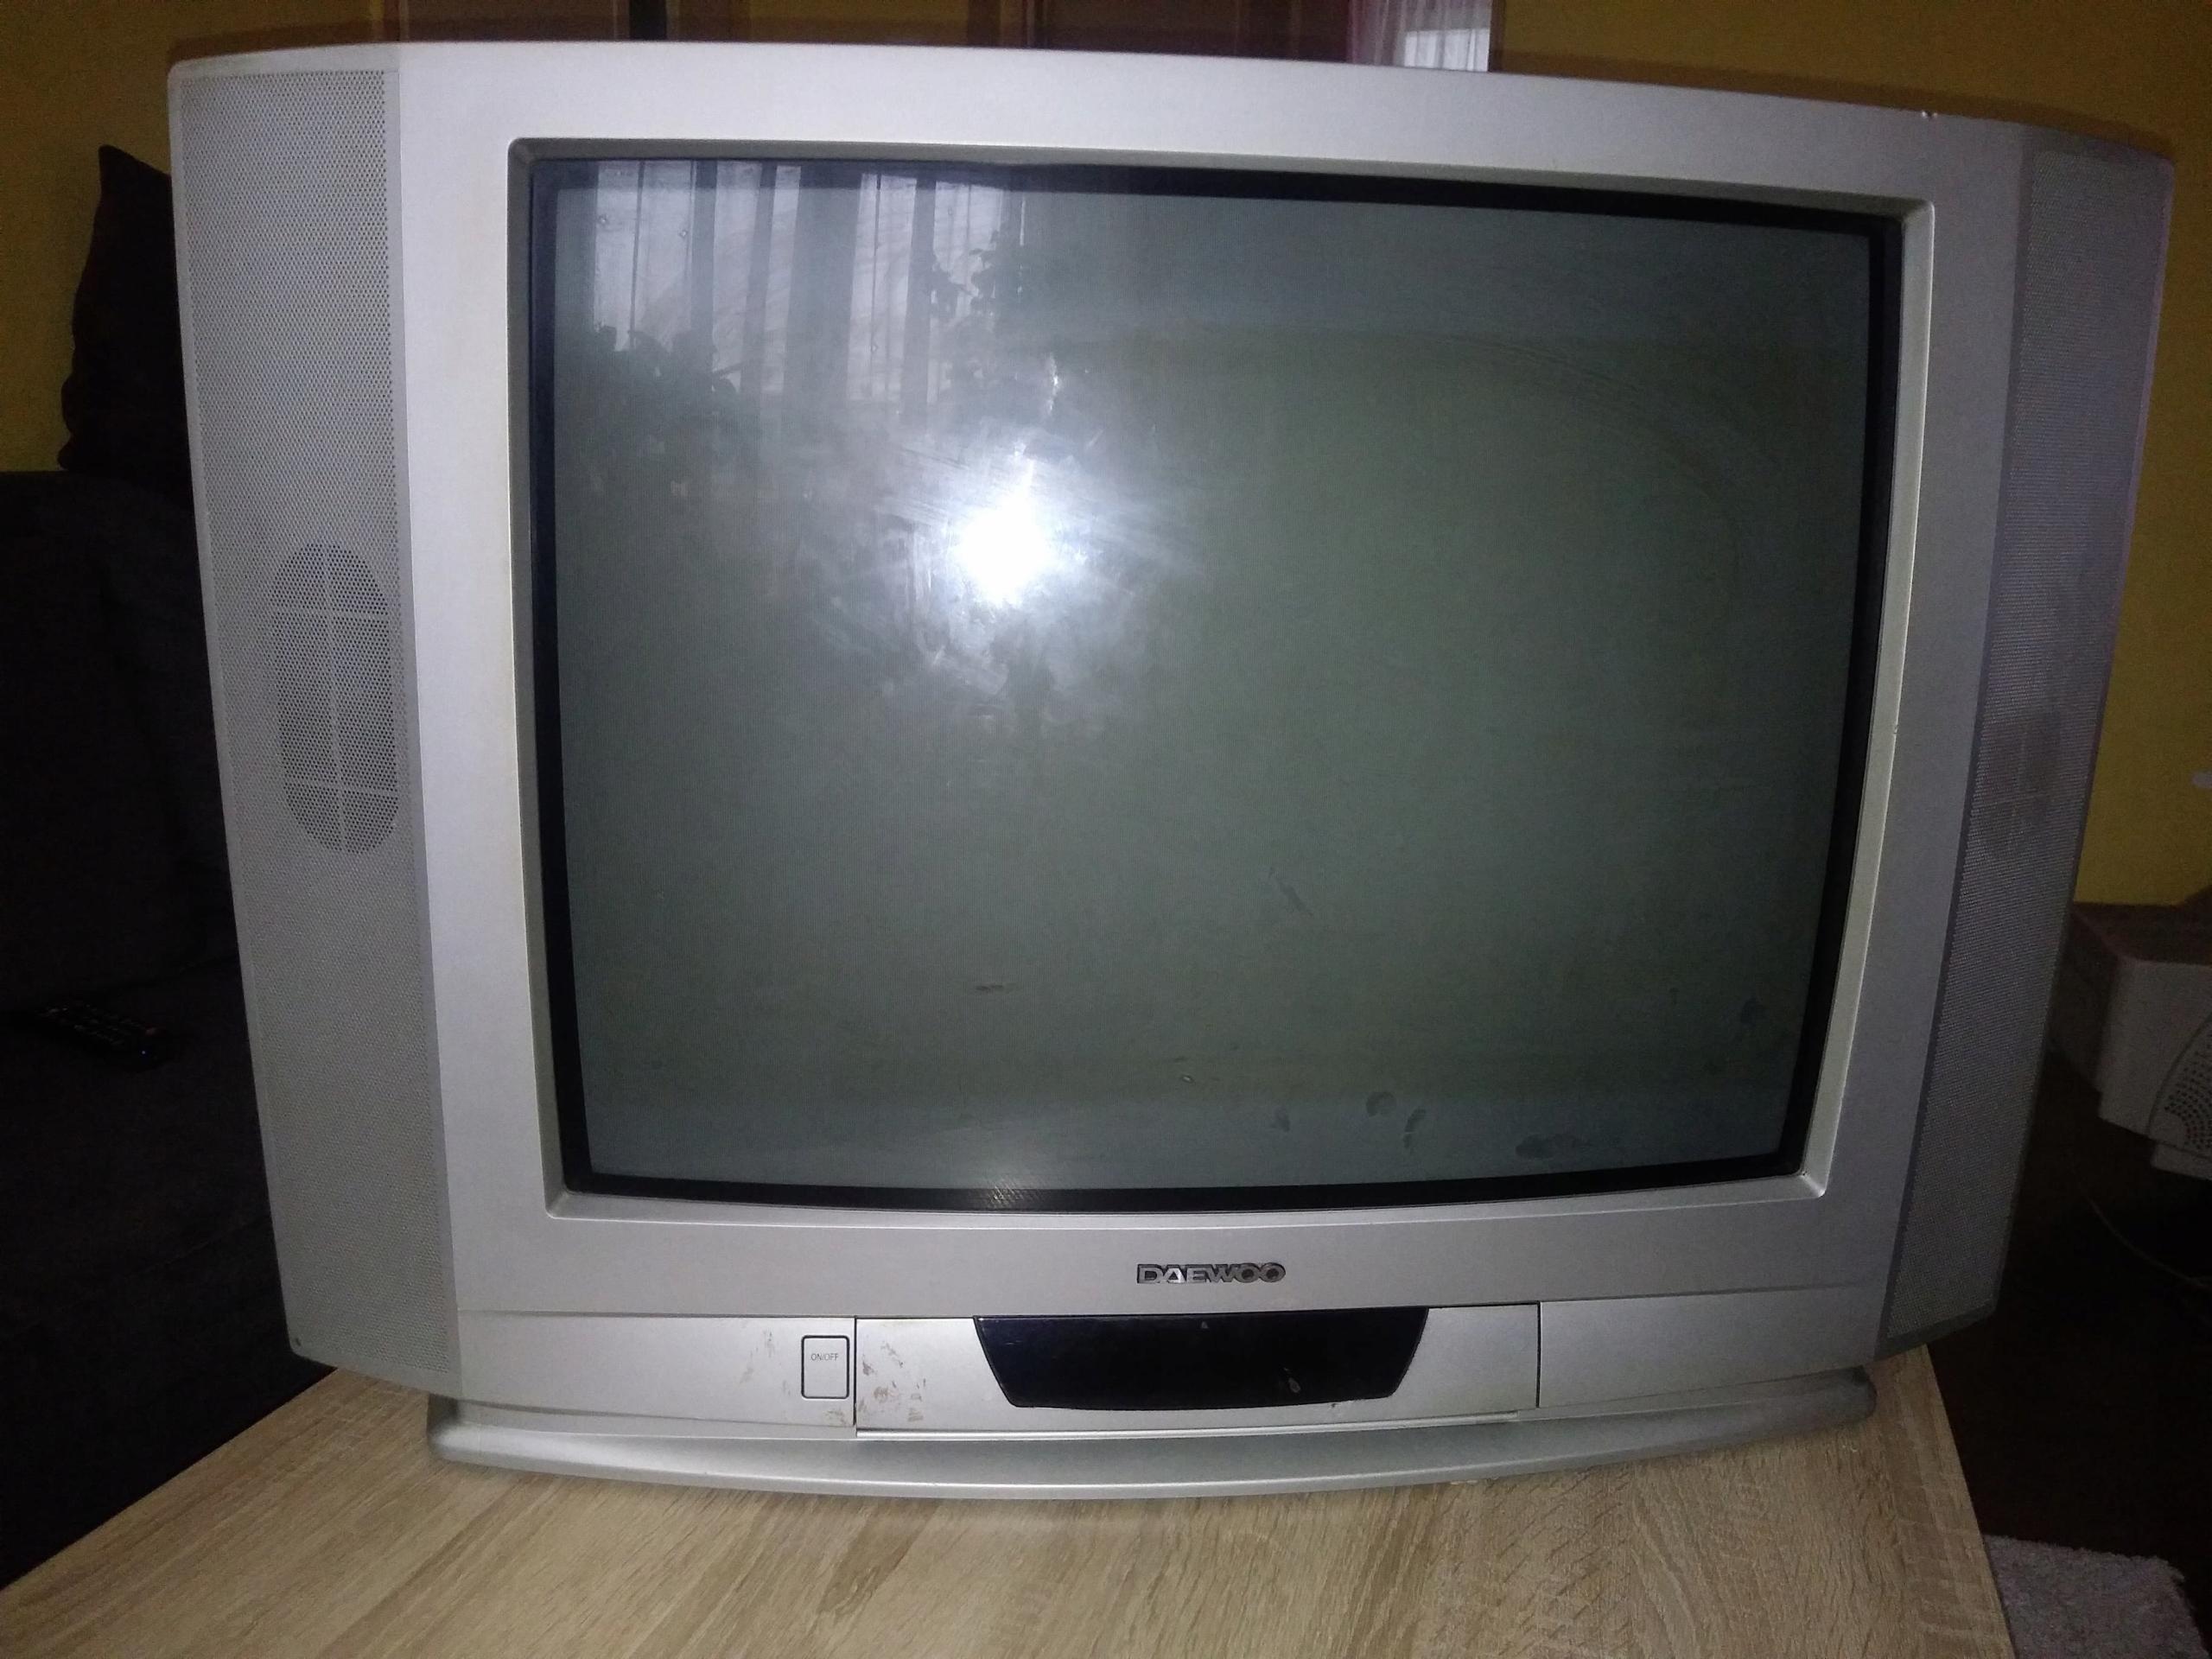 Telewizor Daewoo 25 cali